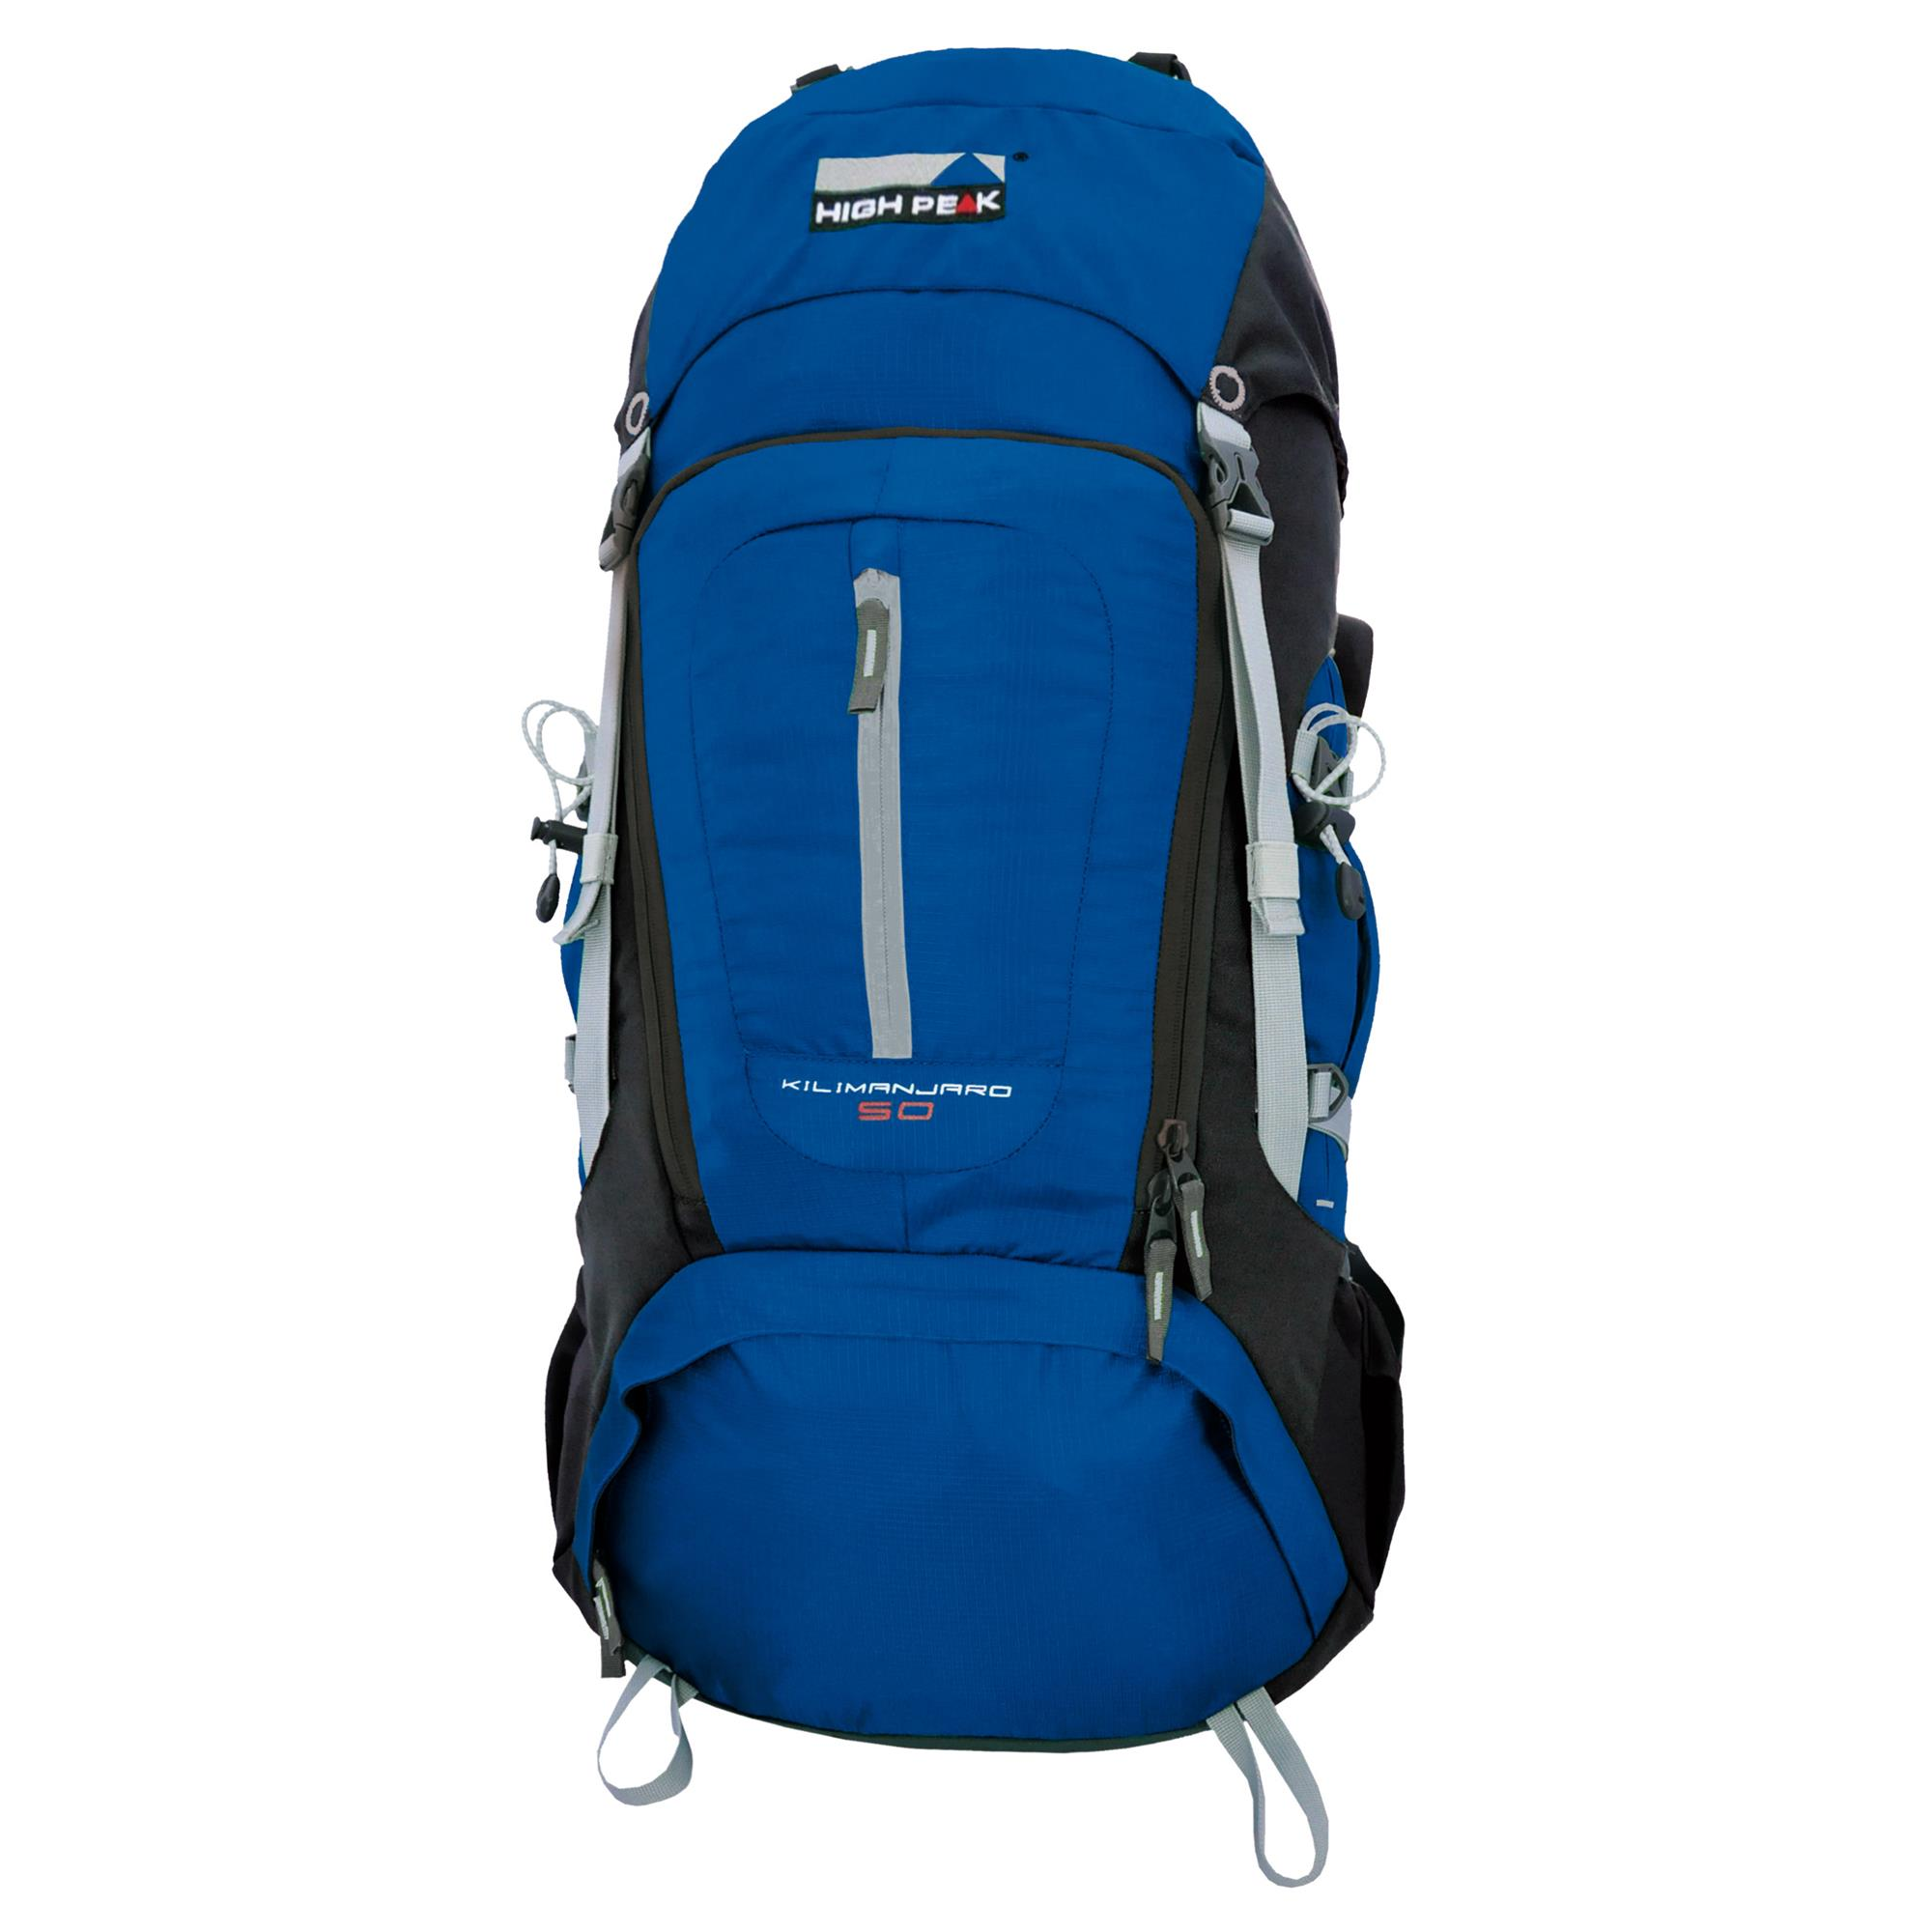 Рюкзак Kilimanjaro 70 синий, 70л, 1710 гр, 30215, Велосипедные рюкзаки - арт. 824860281